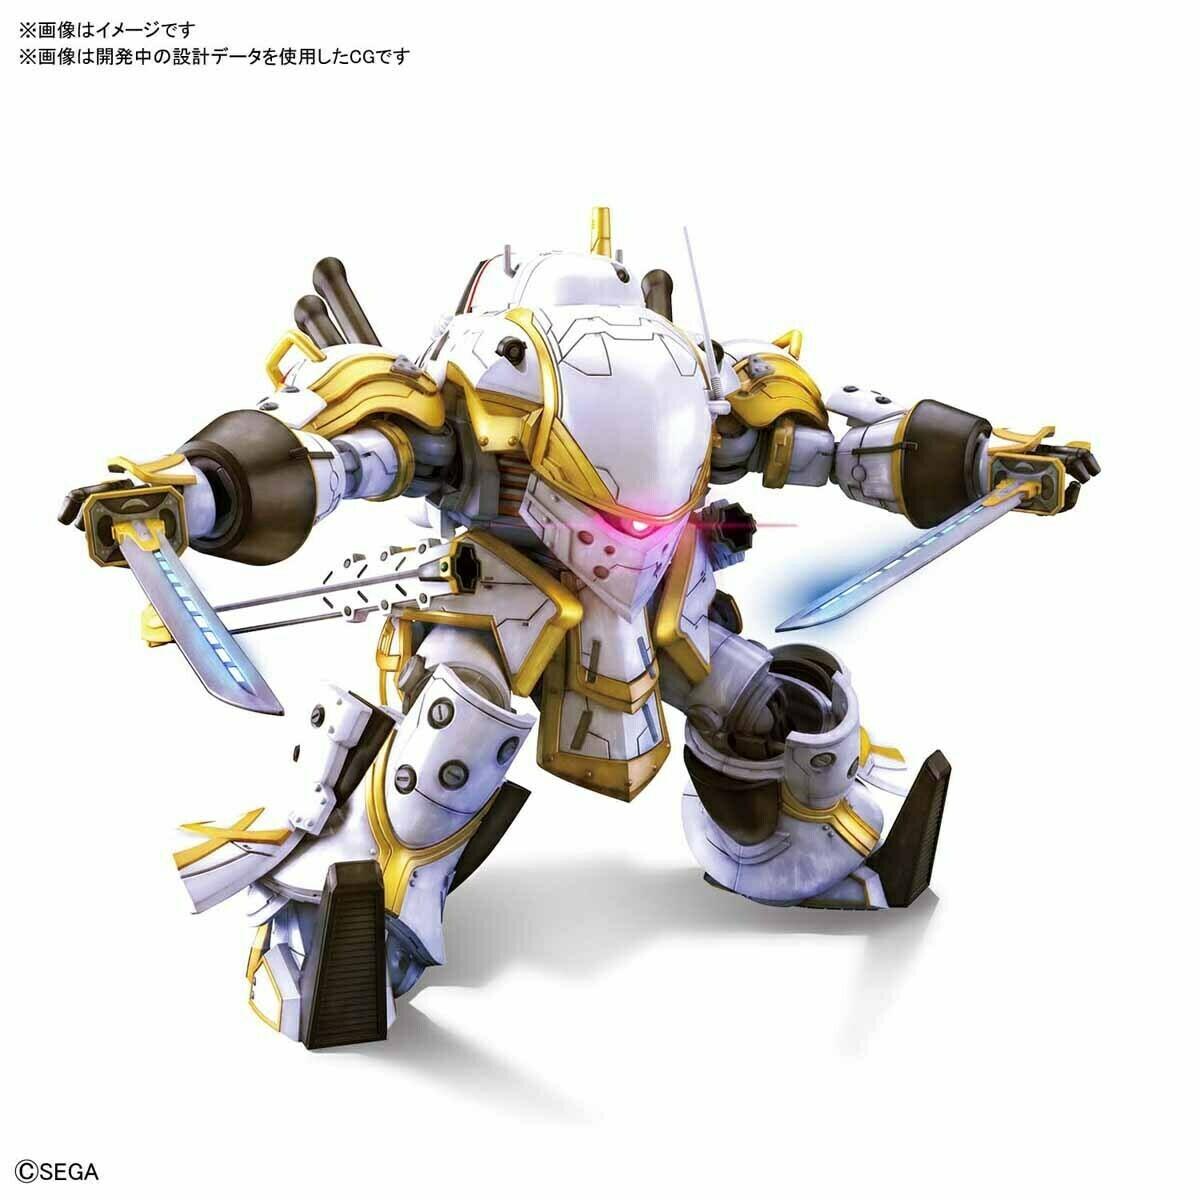 PRE-ORDER HG 1/24 SPIRICLE STRIKER・MUGEN (SEIJURO KAMIYAMA TYPE)